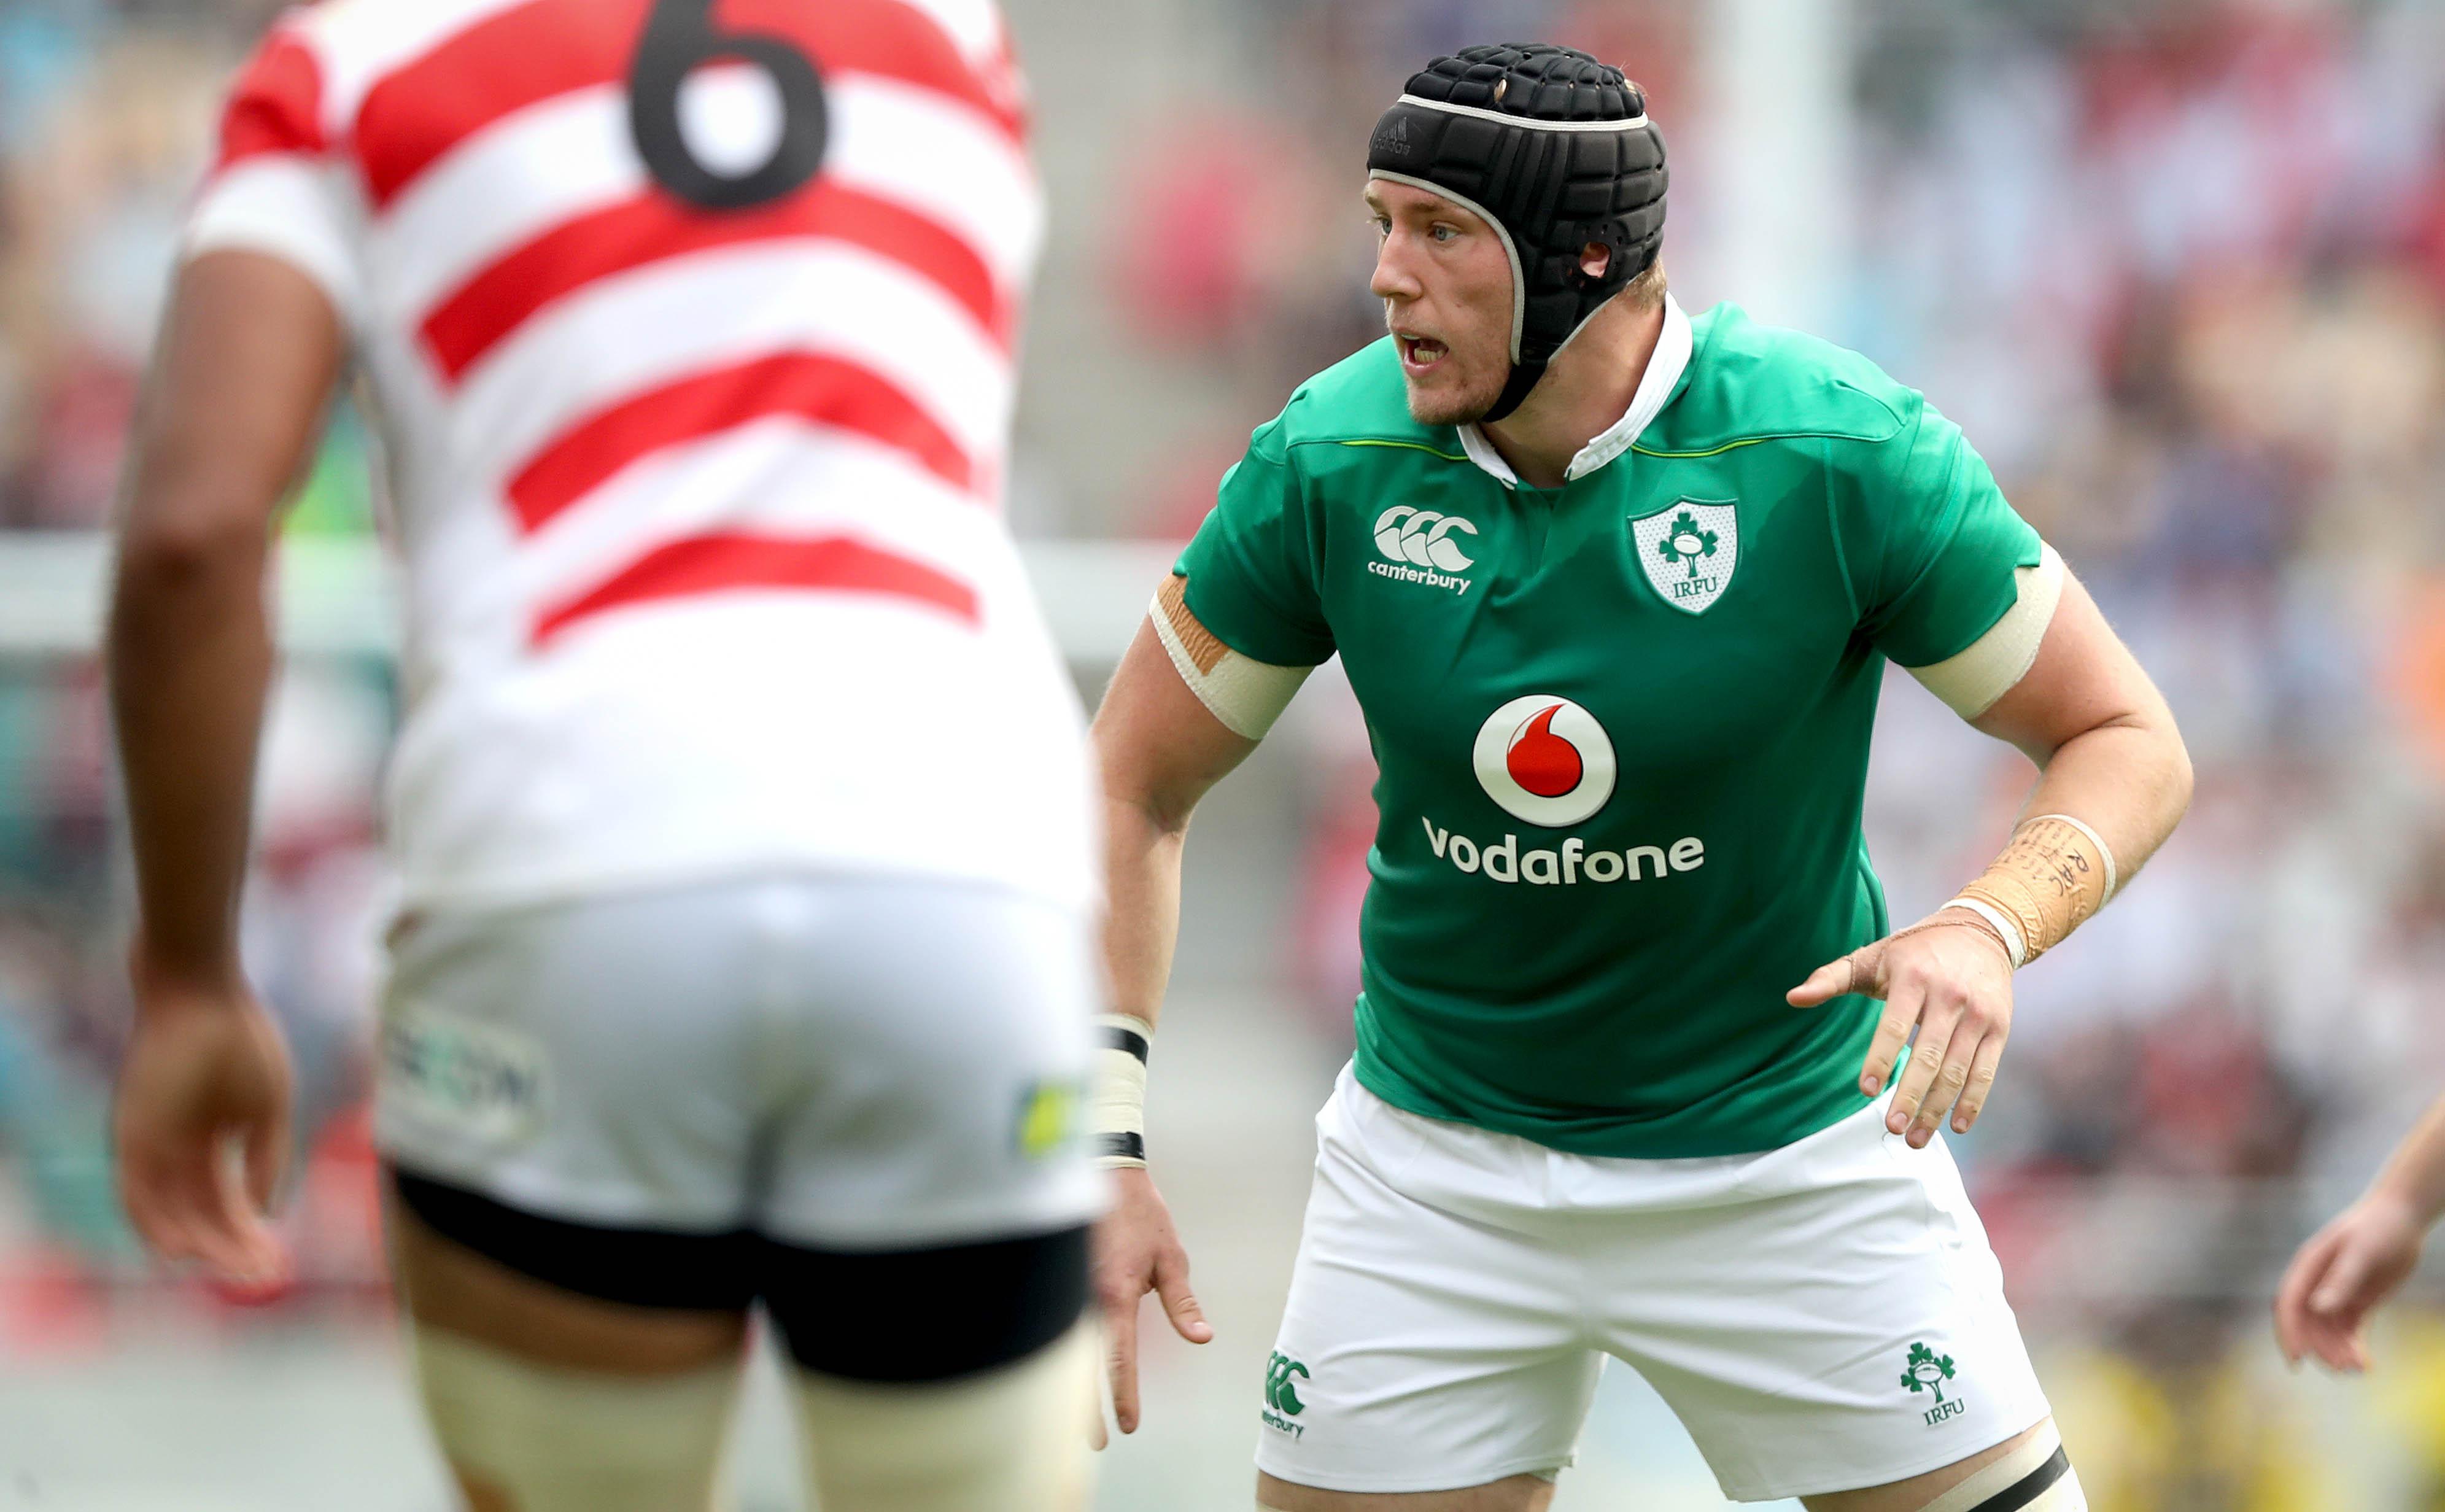 Kieran Treadwell playing for Ireland